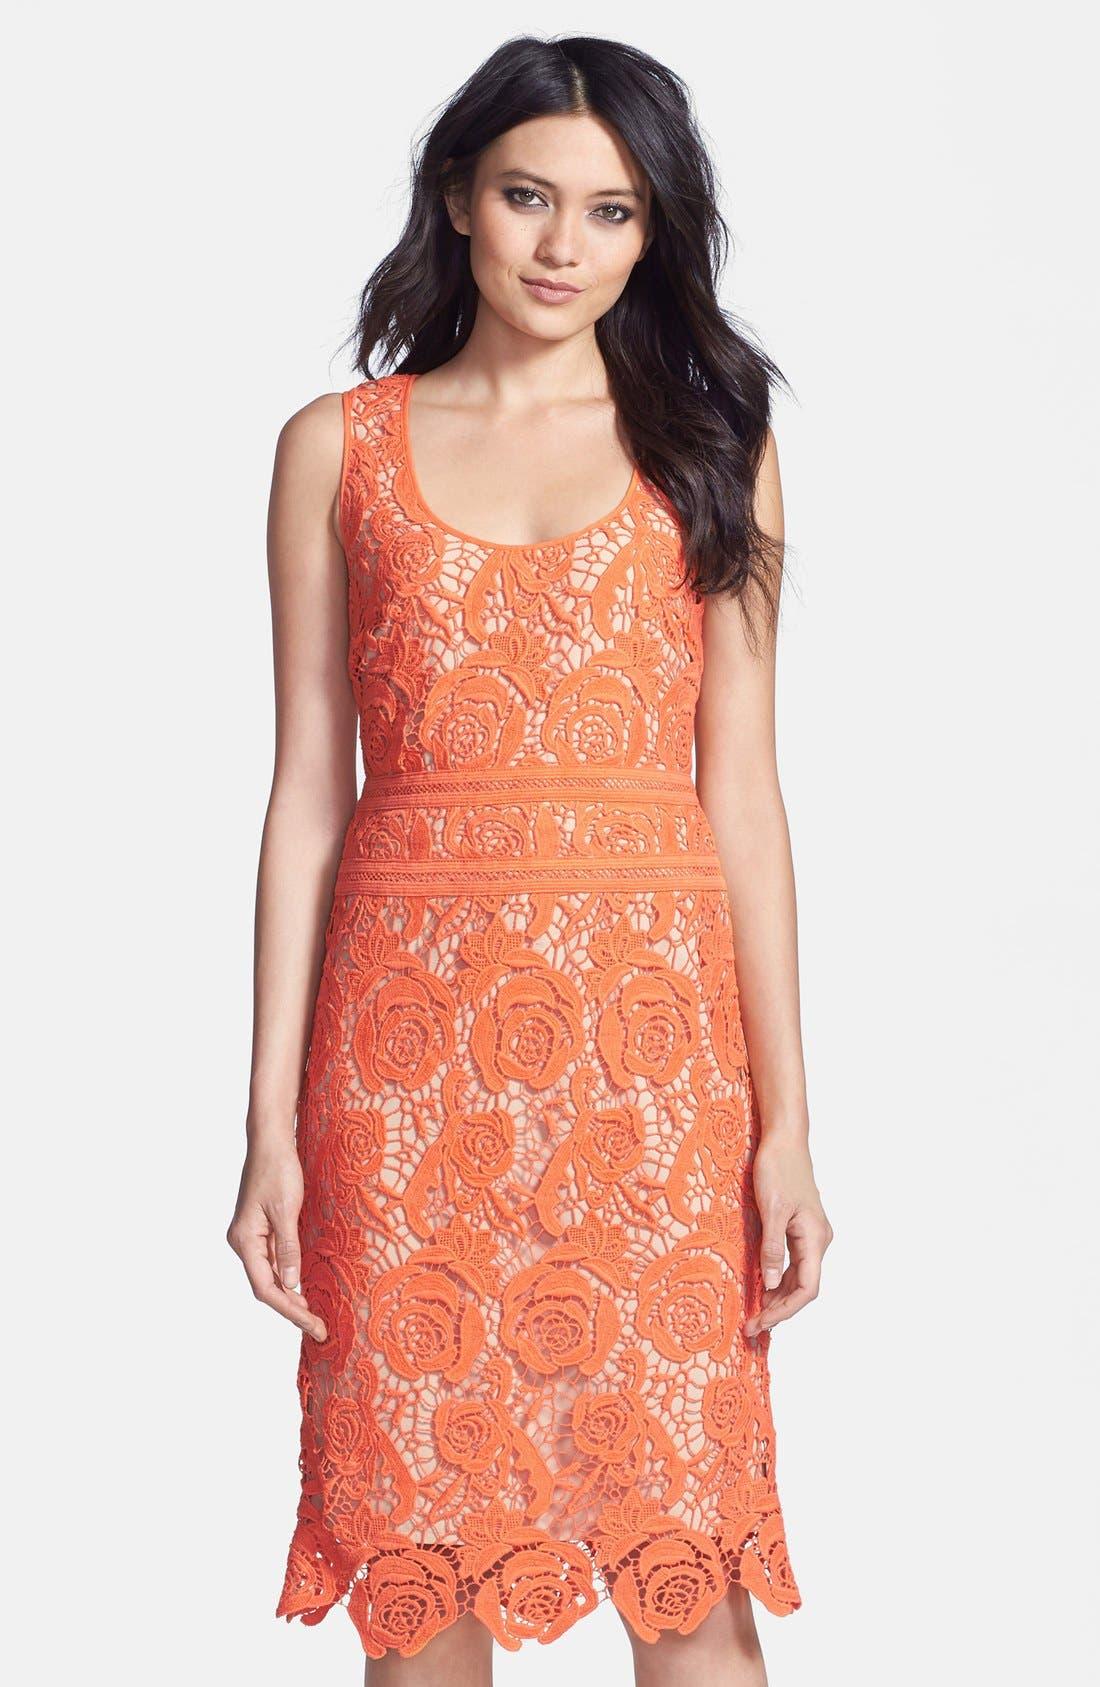 Alternate Image 1 Selected - Nicole Miller Neon Venetian Lace Sheath Dress